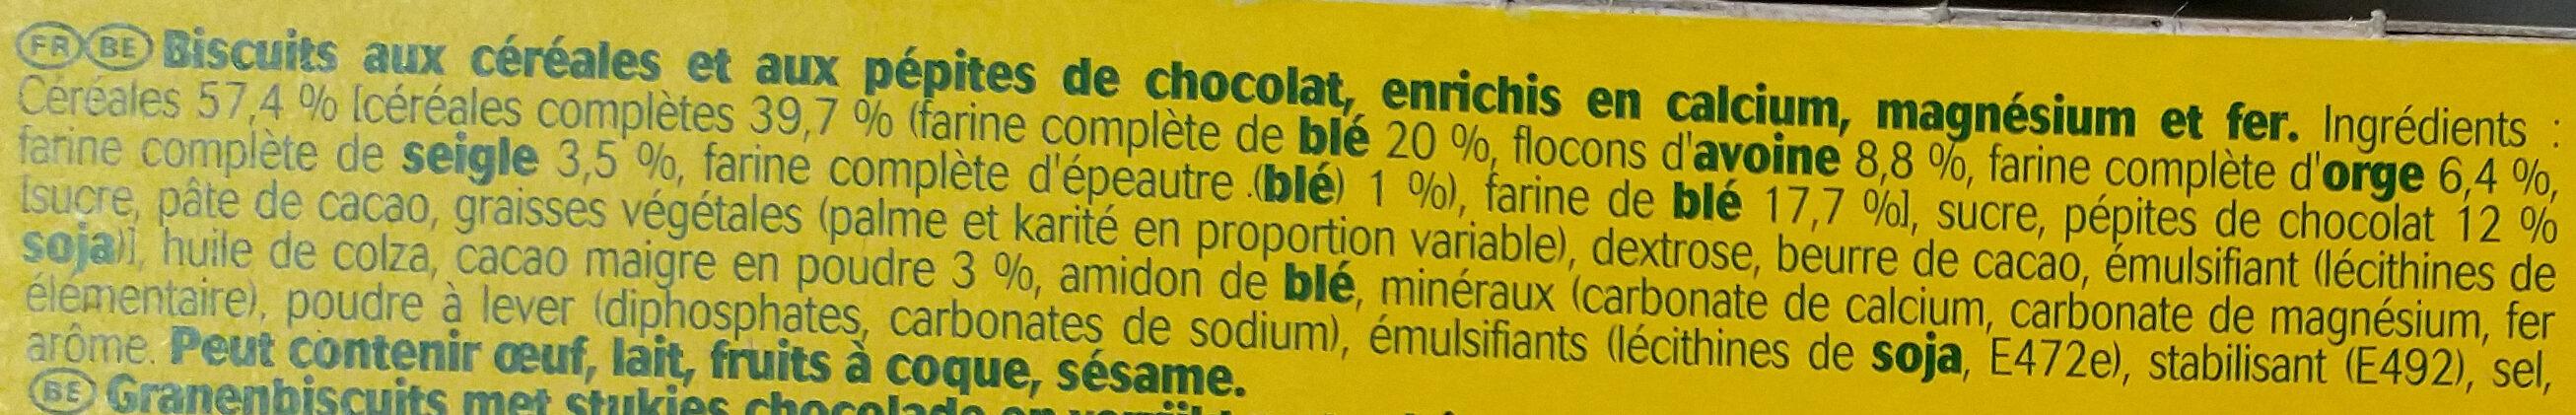 Belvita minis chocolat - Ingrédients - fr